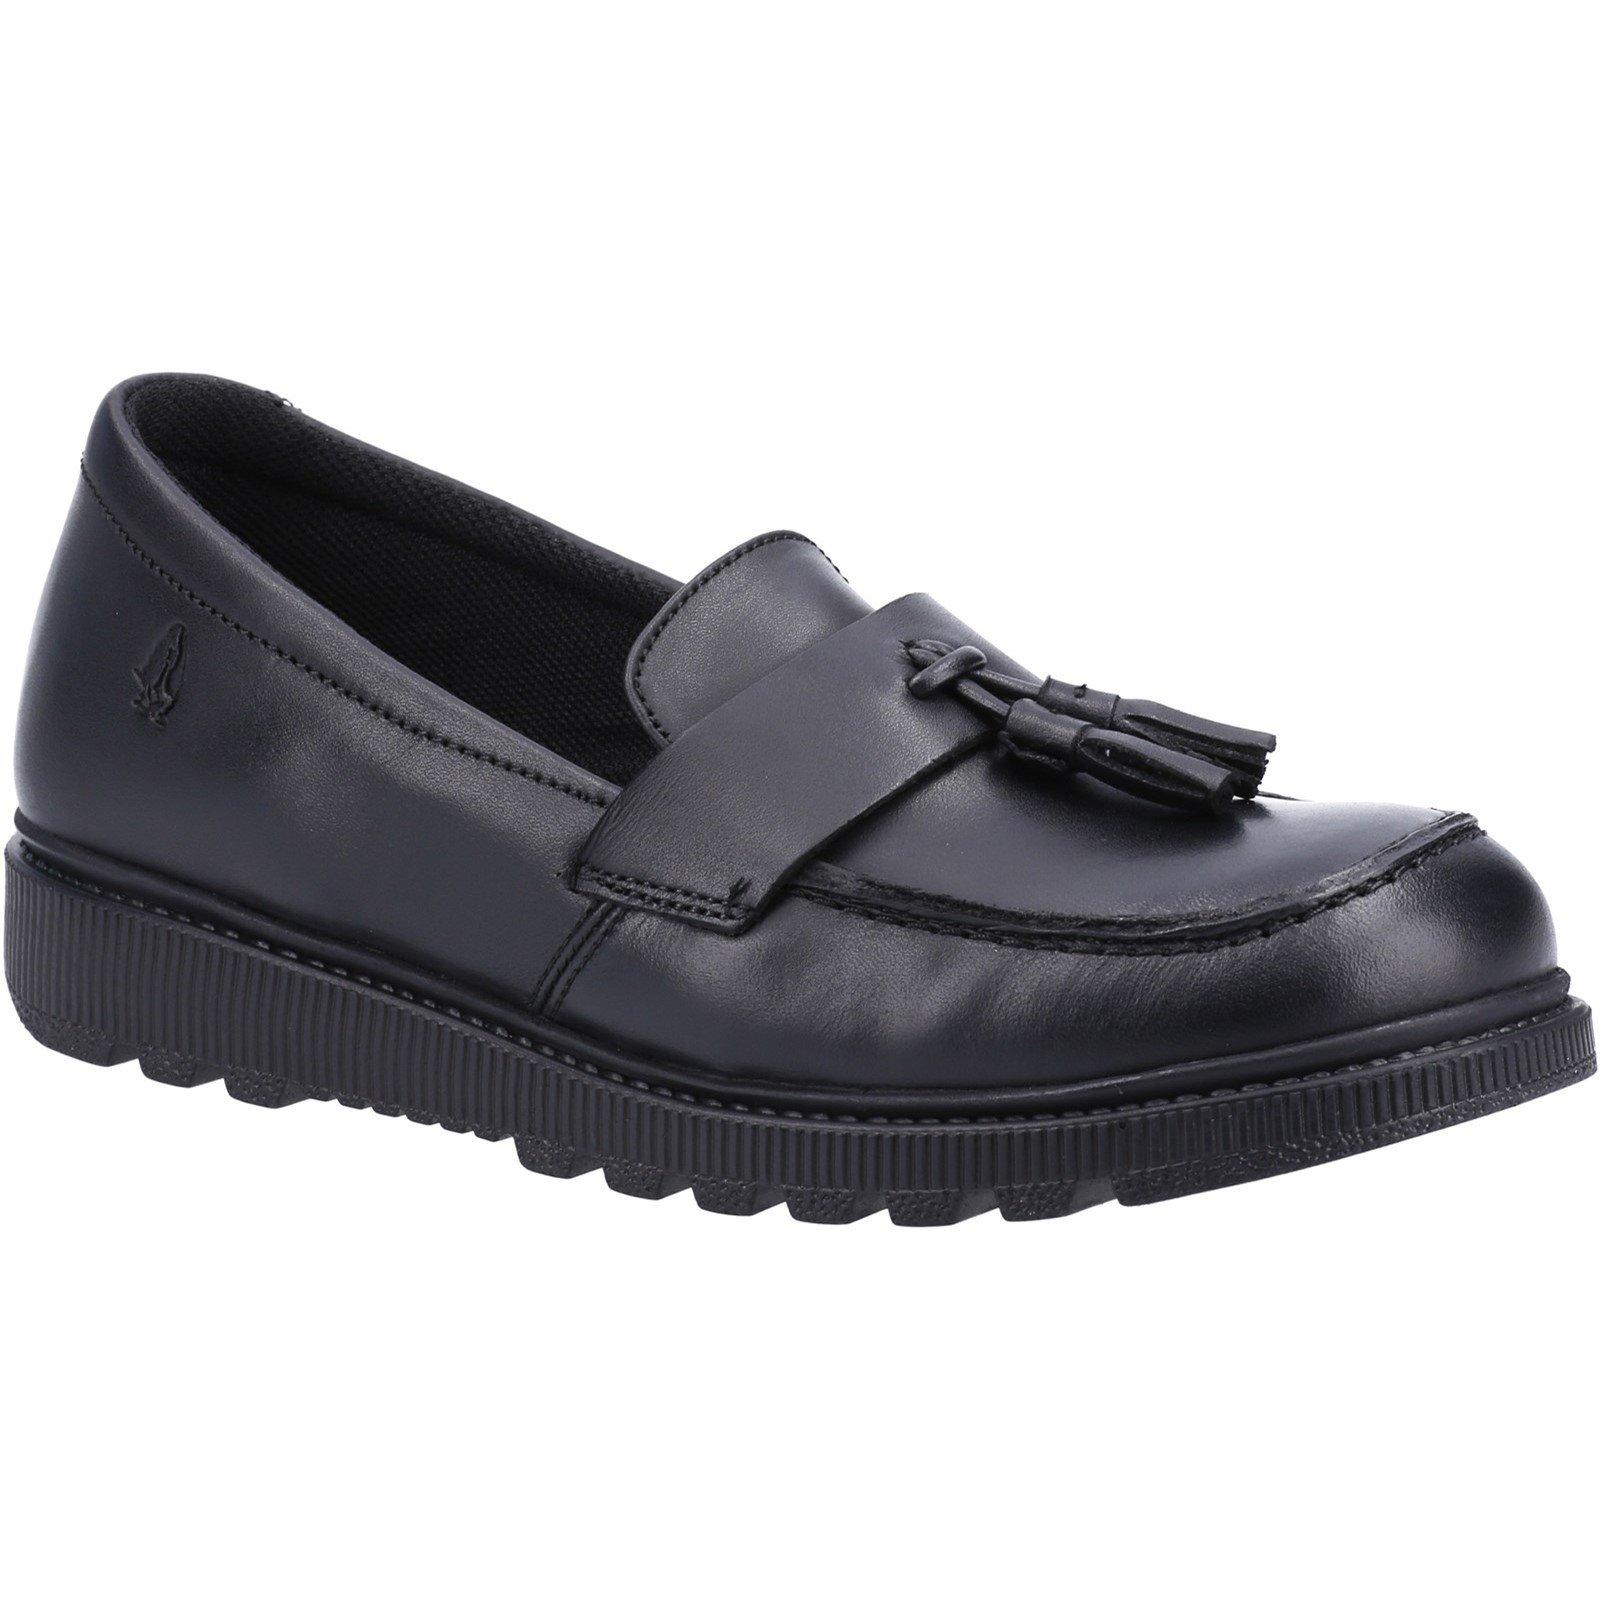 Hush Puppies Kid's Faye Senior School Shoe Patent Black 30844 - Patent Black 7